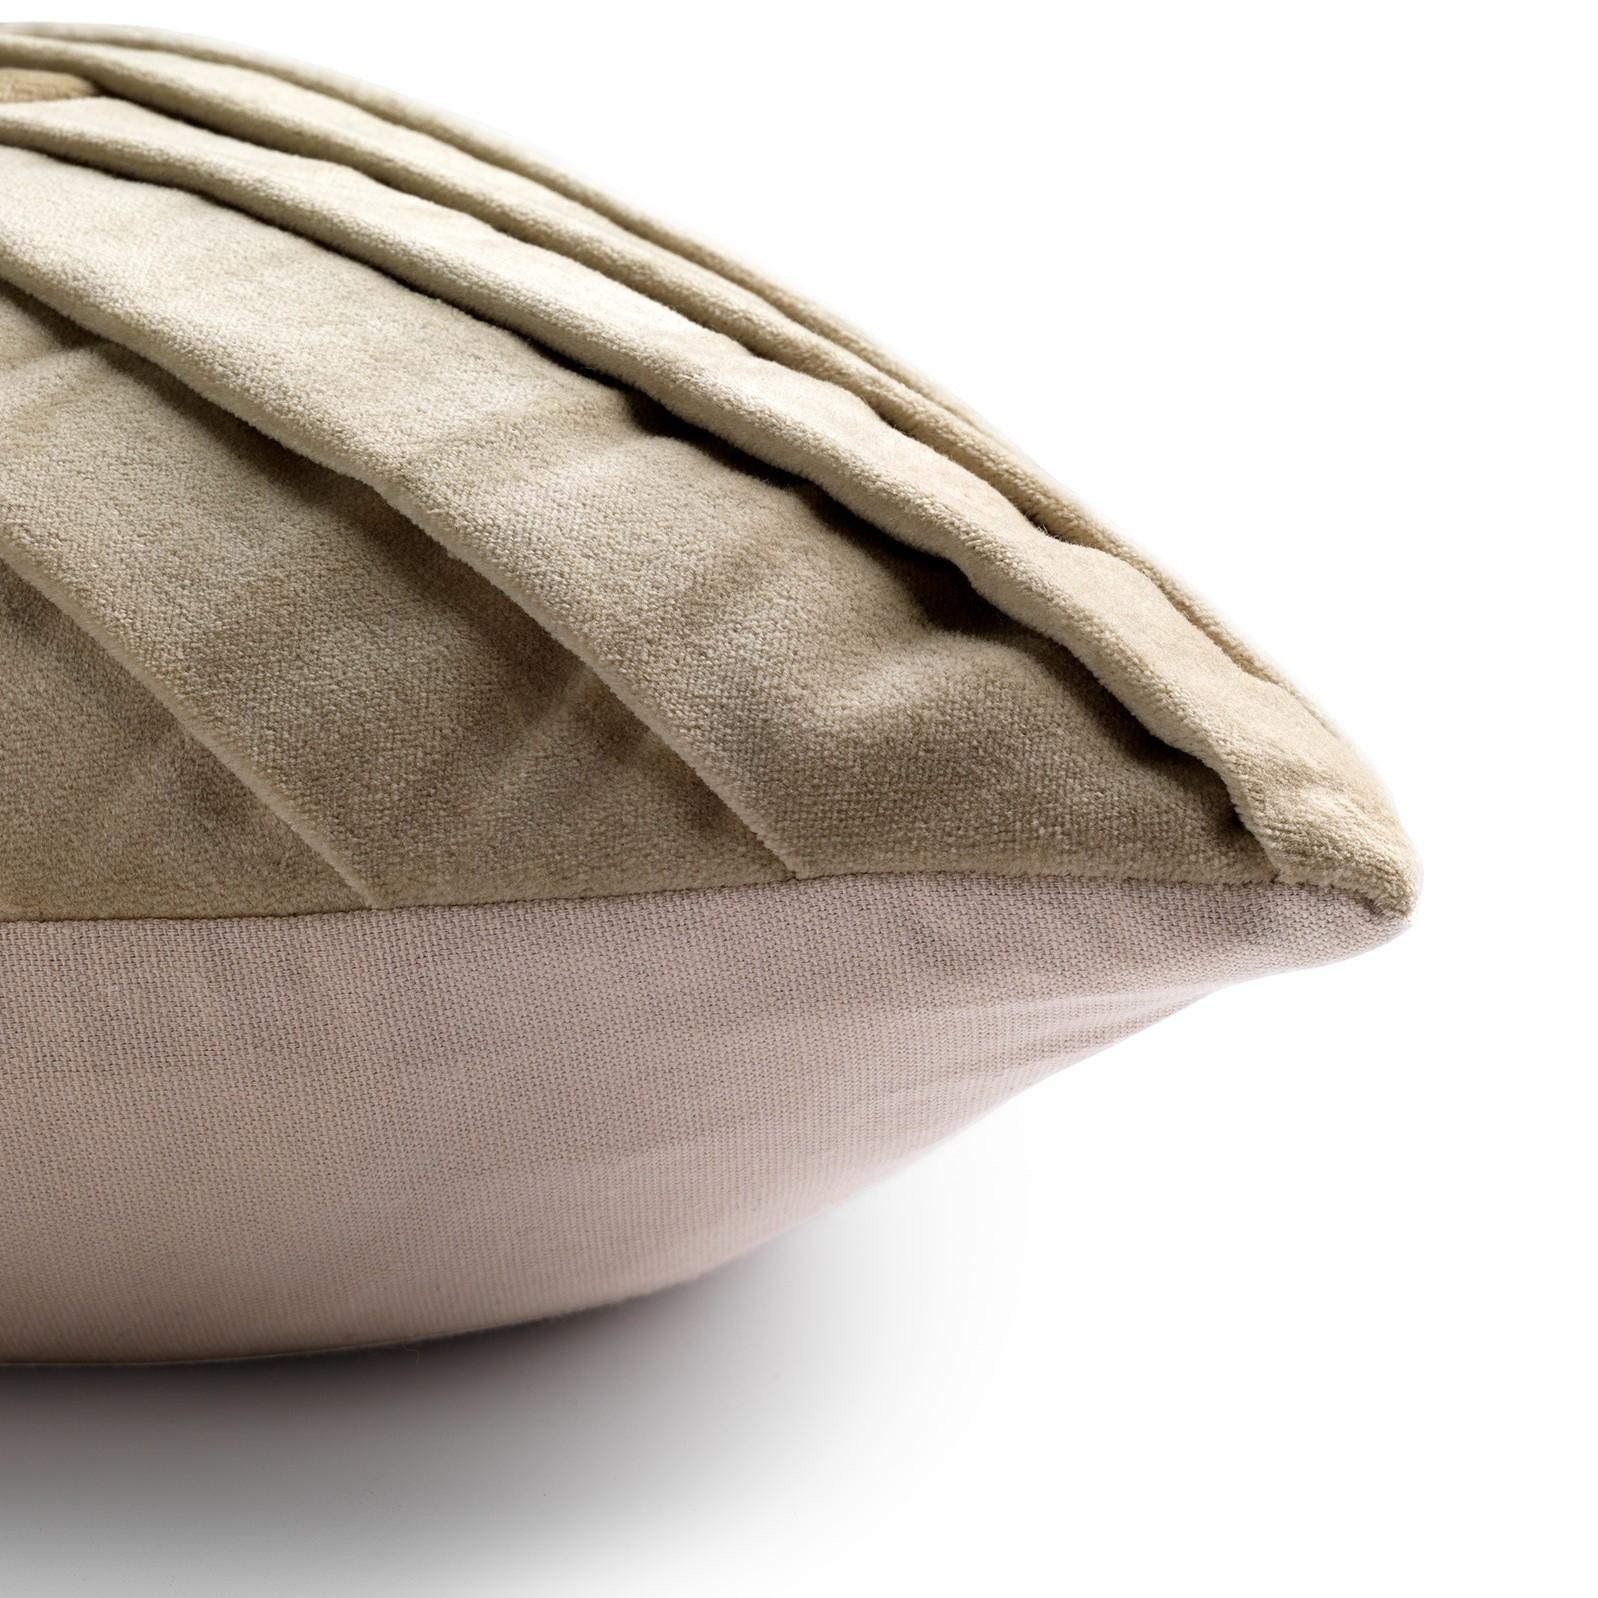 FEMM - Sierkussen velvet Pumice Stone 30x50 cm